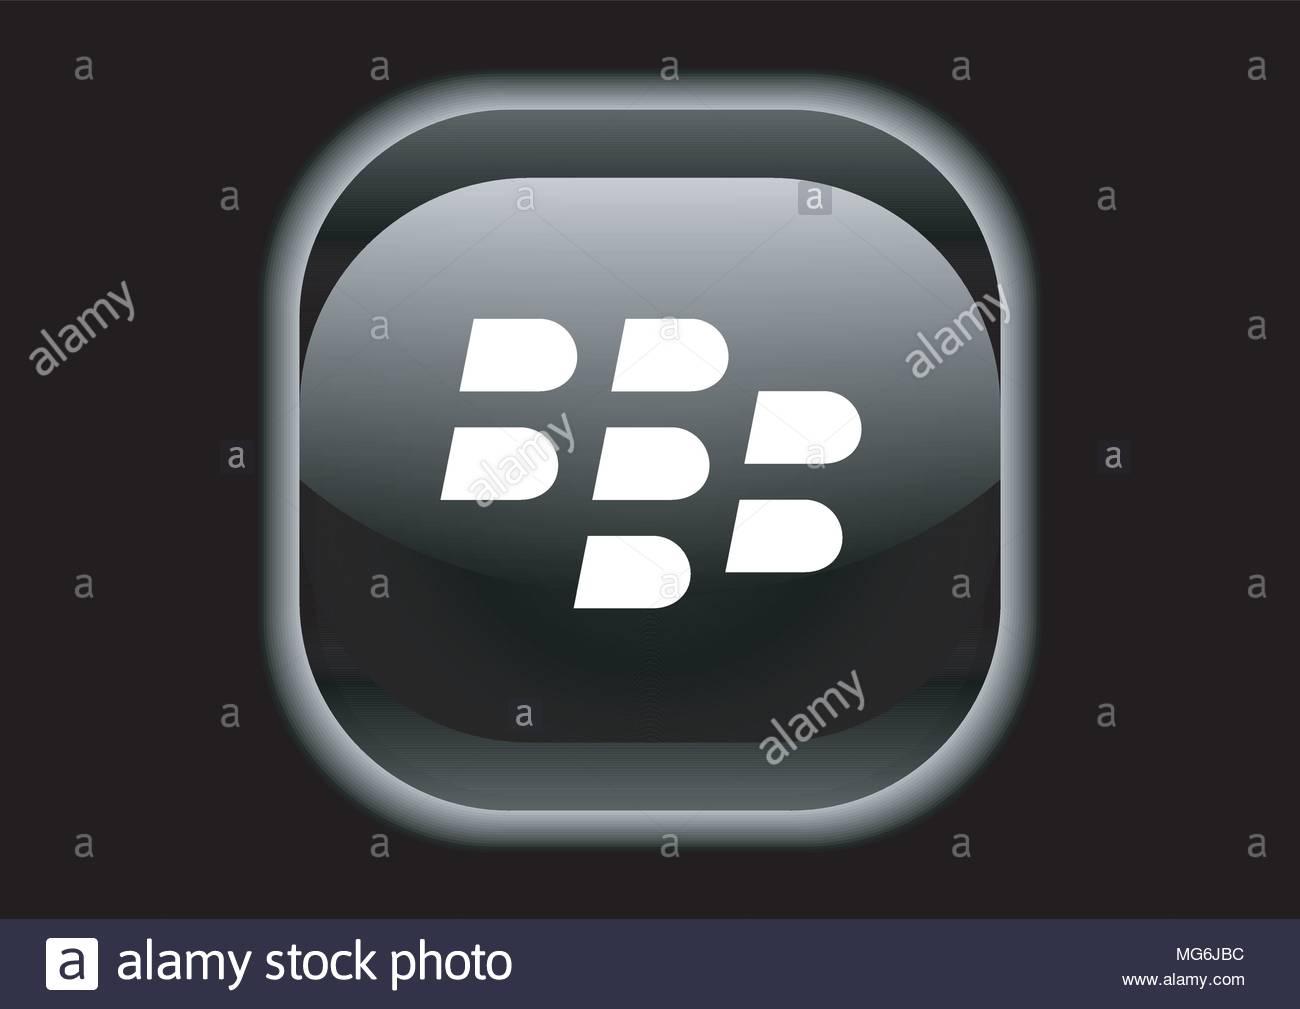 Google search icon on Blackberry - BlackBerry Forums ...